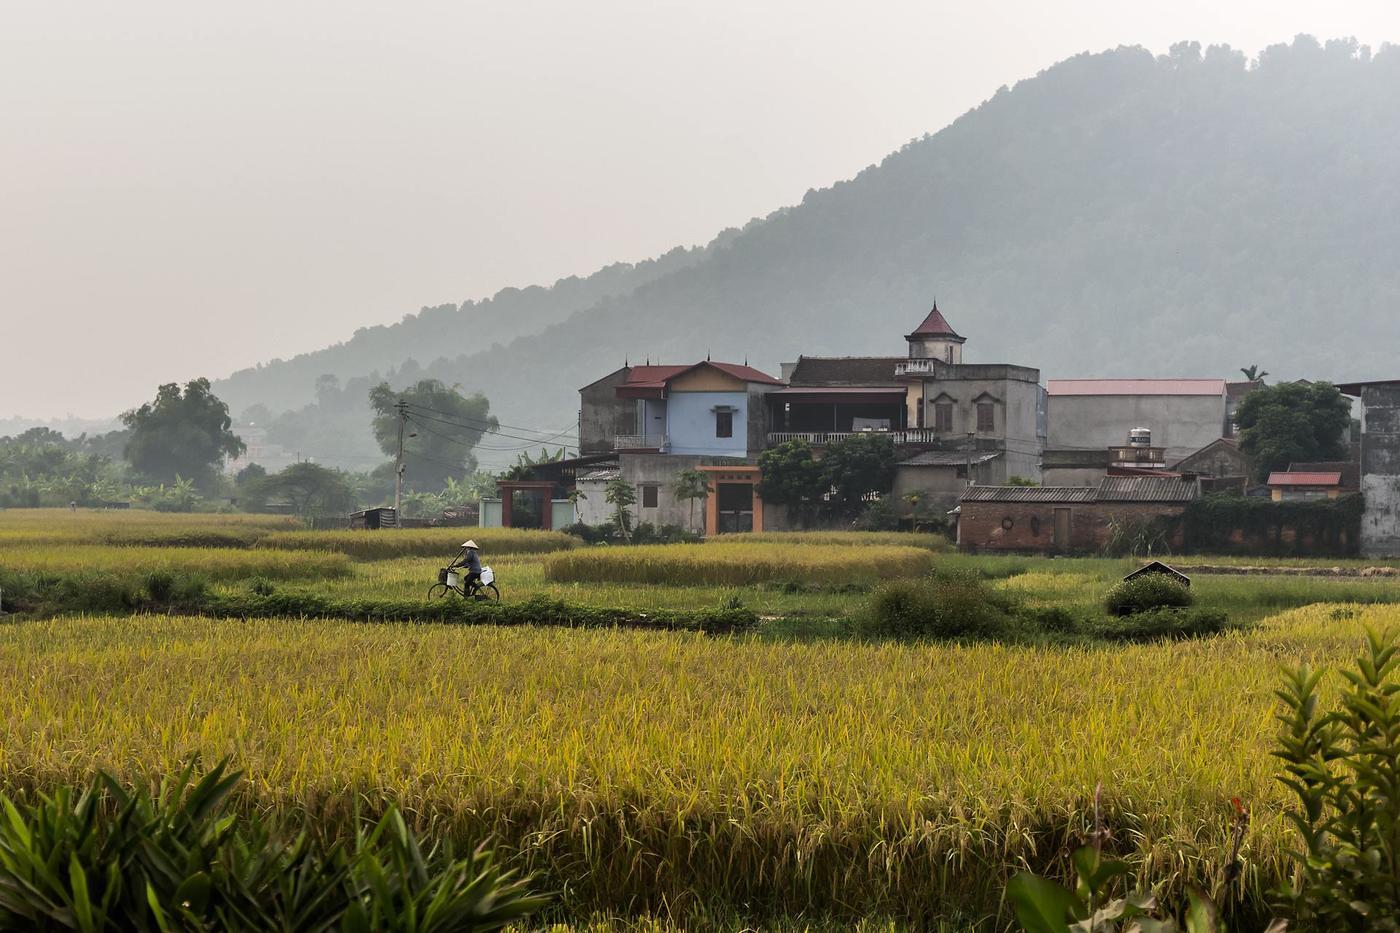 arroz vietnamita (Jose Luis Rubio Perez)